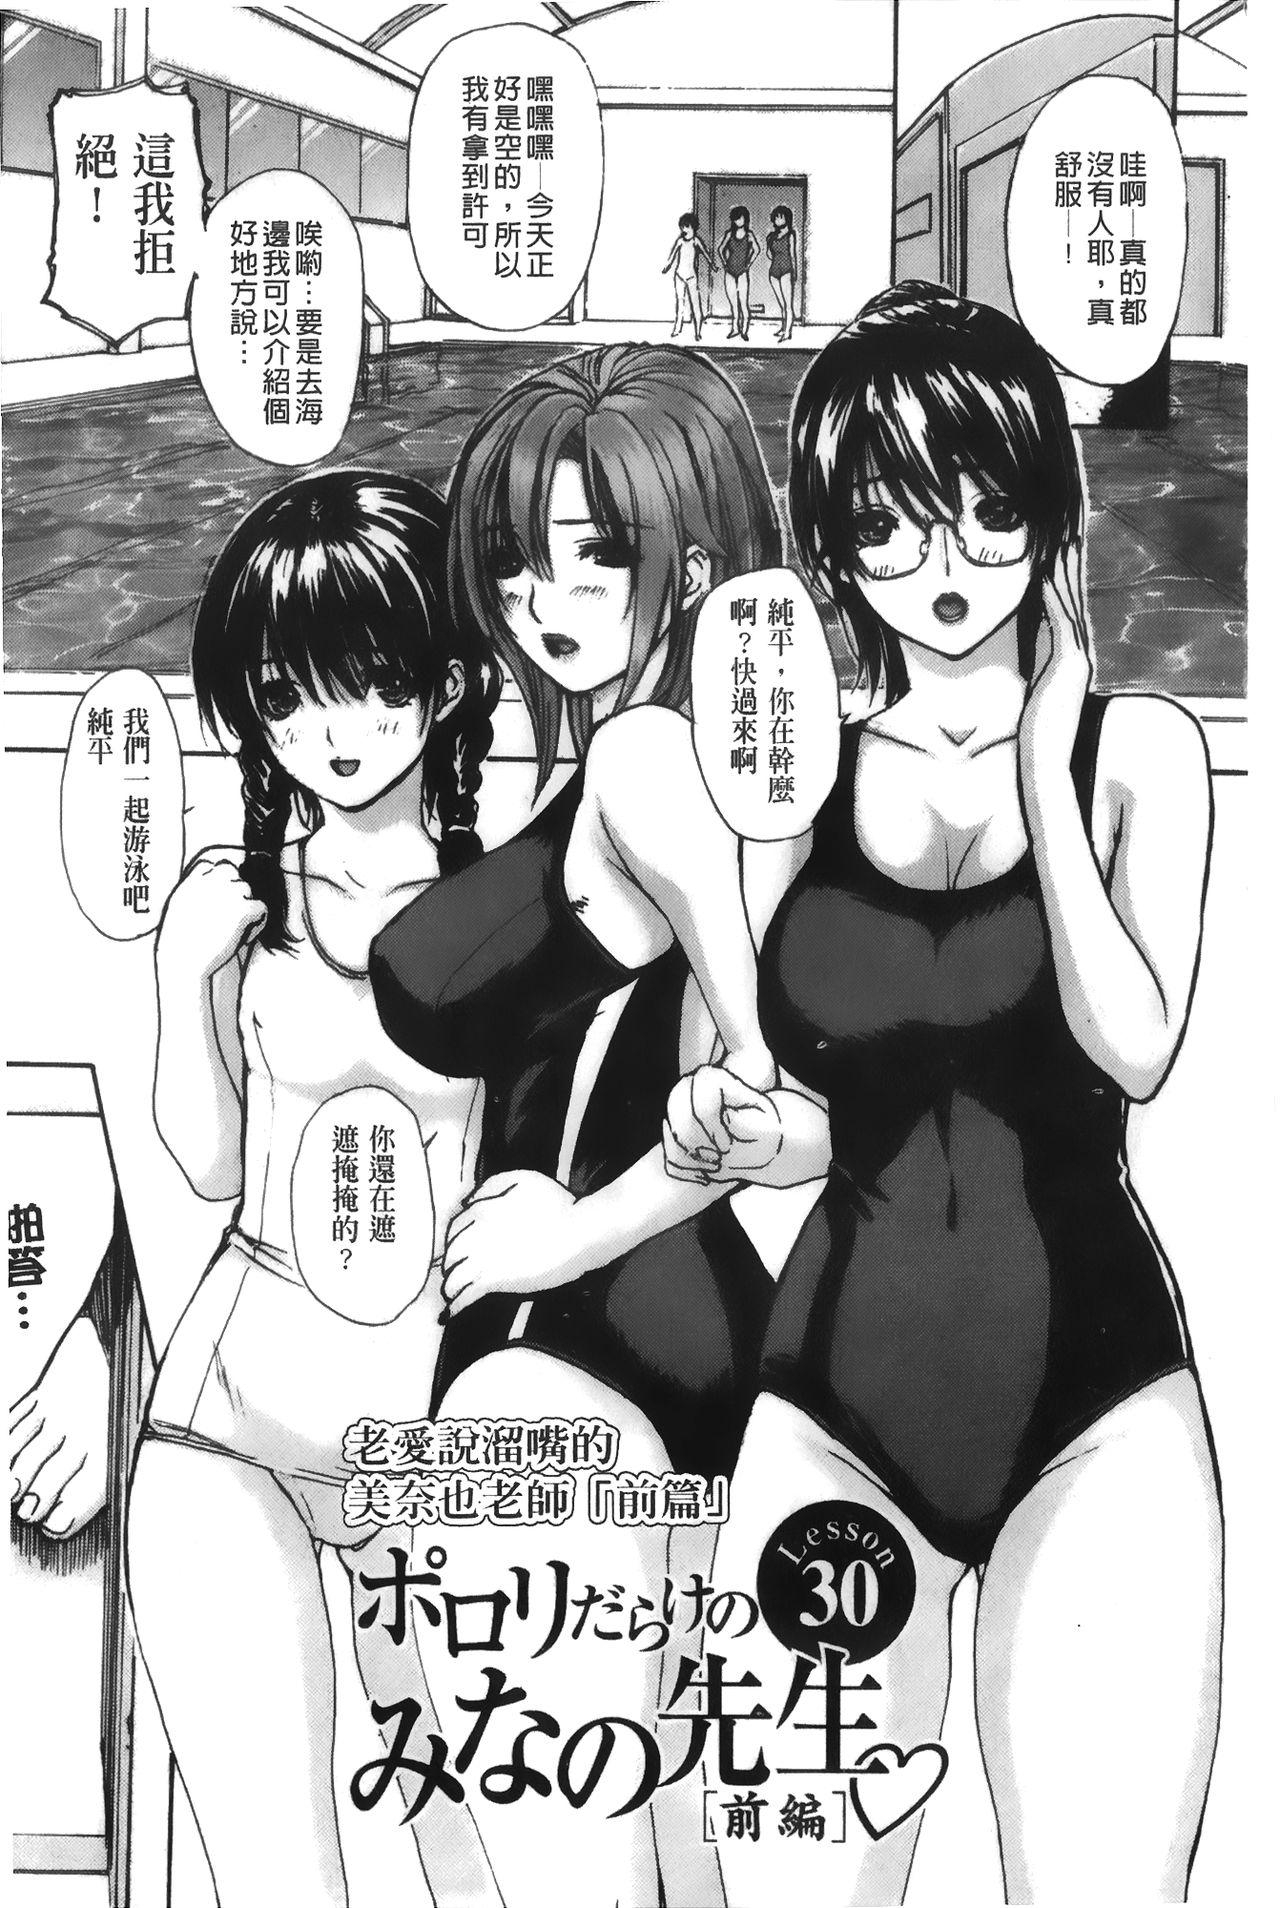 Tonari no Minano Sensei 4 | 隔壁的美奈乃老師 4 7